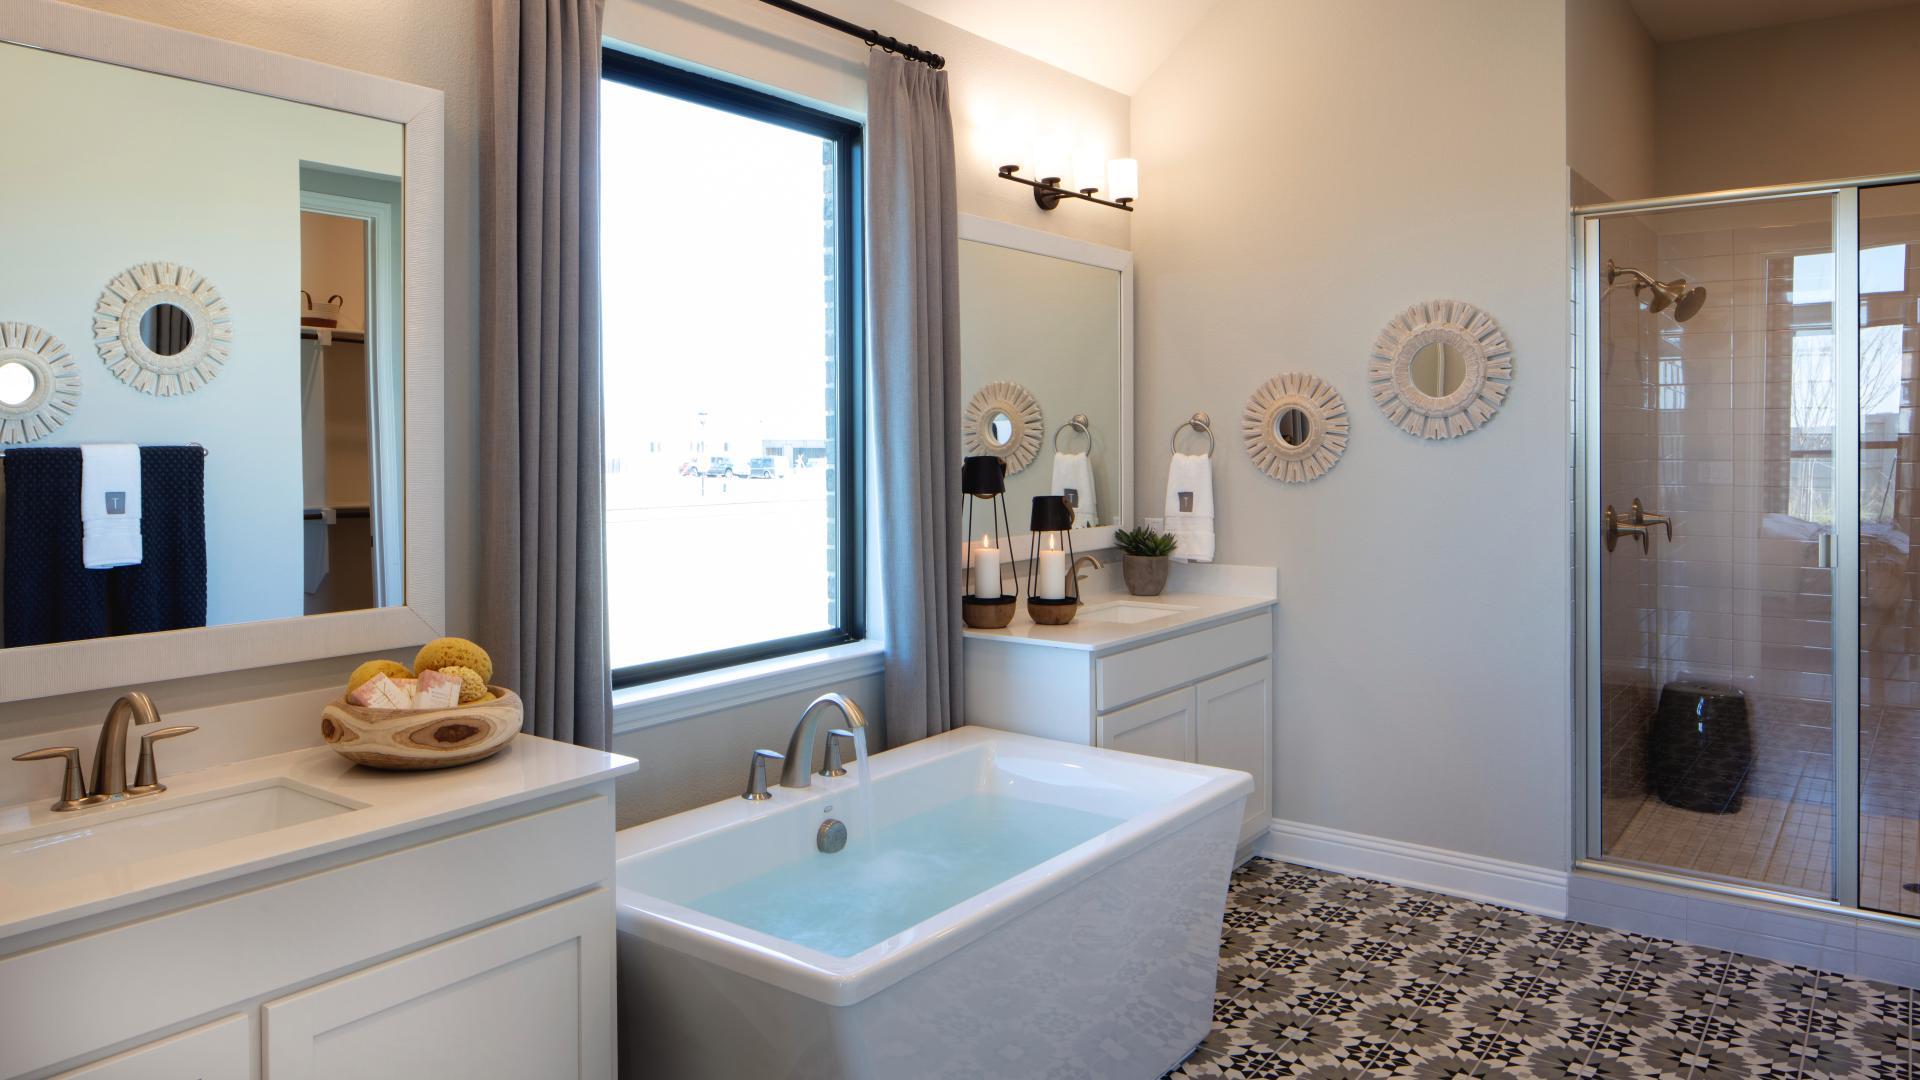 Elegant modern touches throughout the home